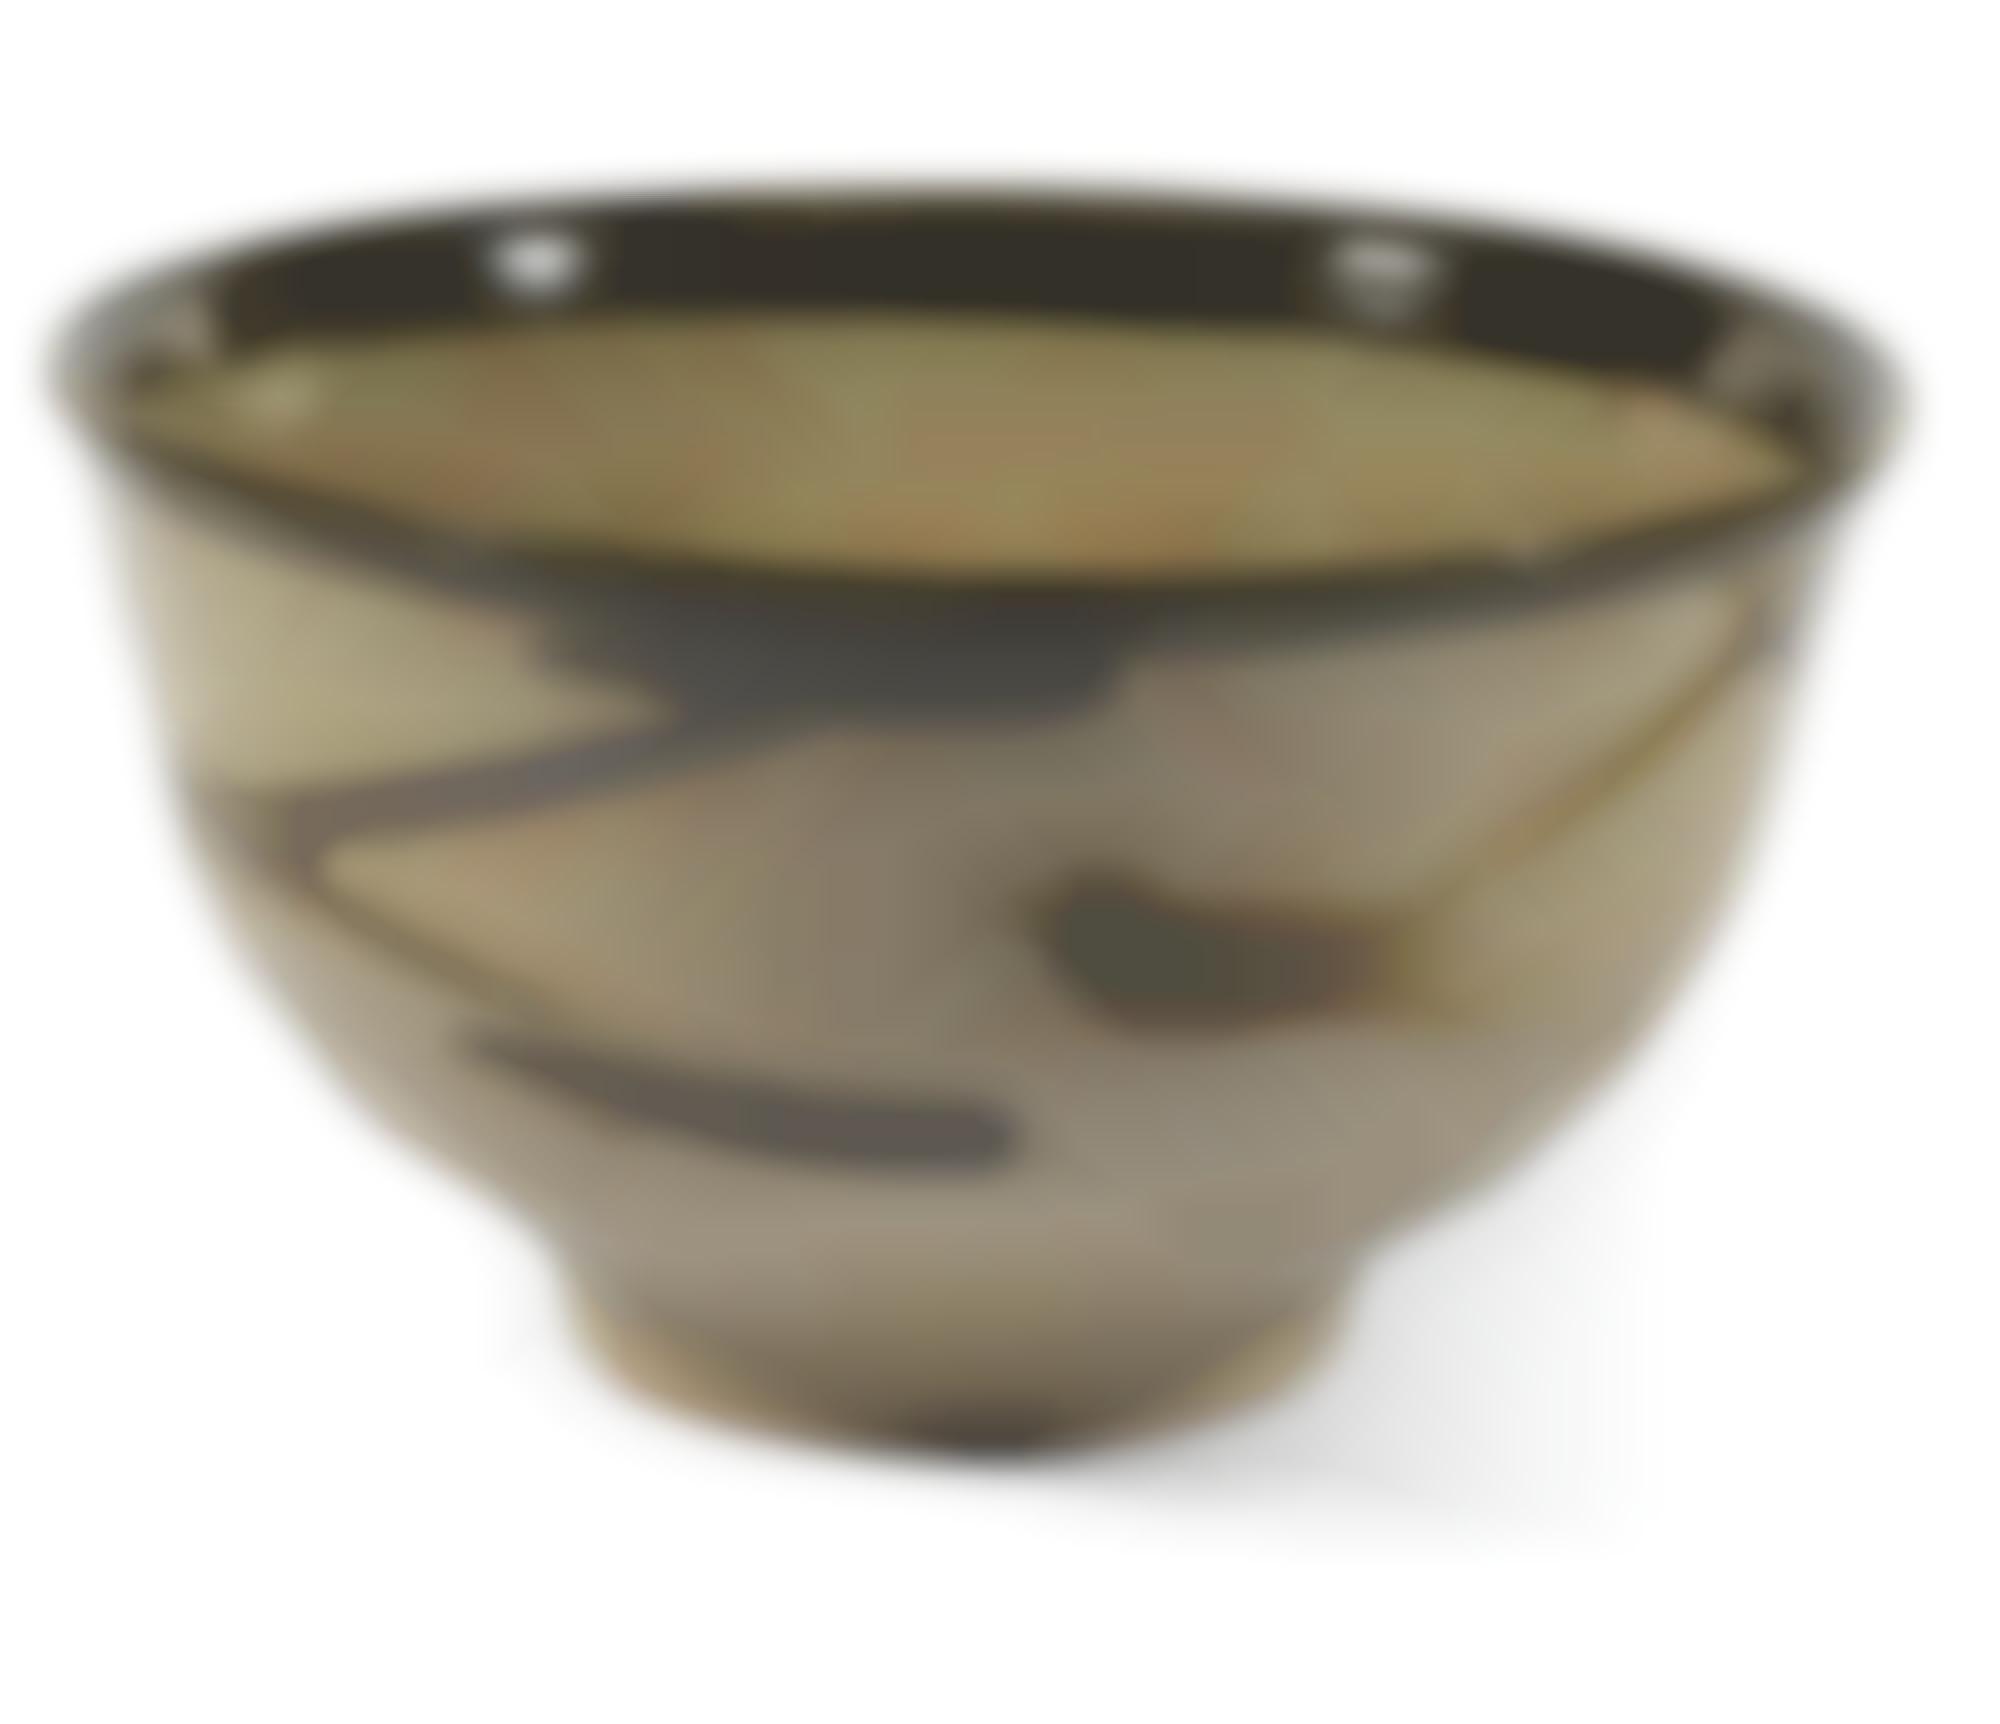 Shoji Hamada-Bowl-